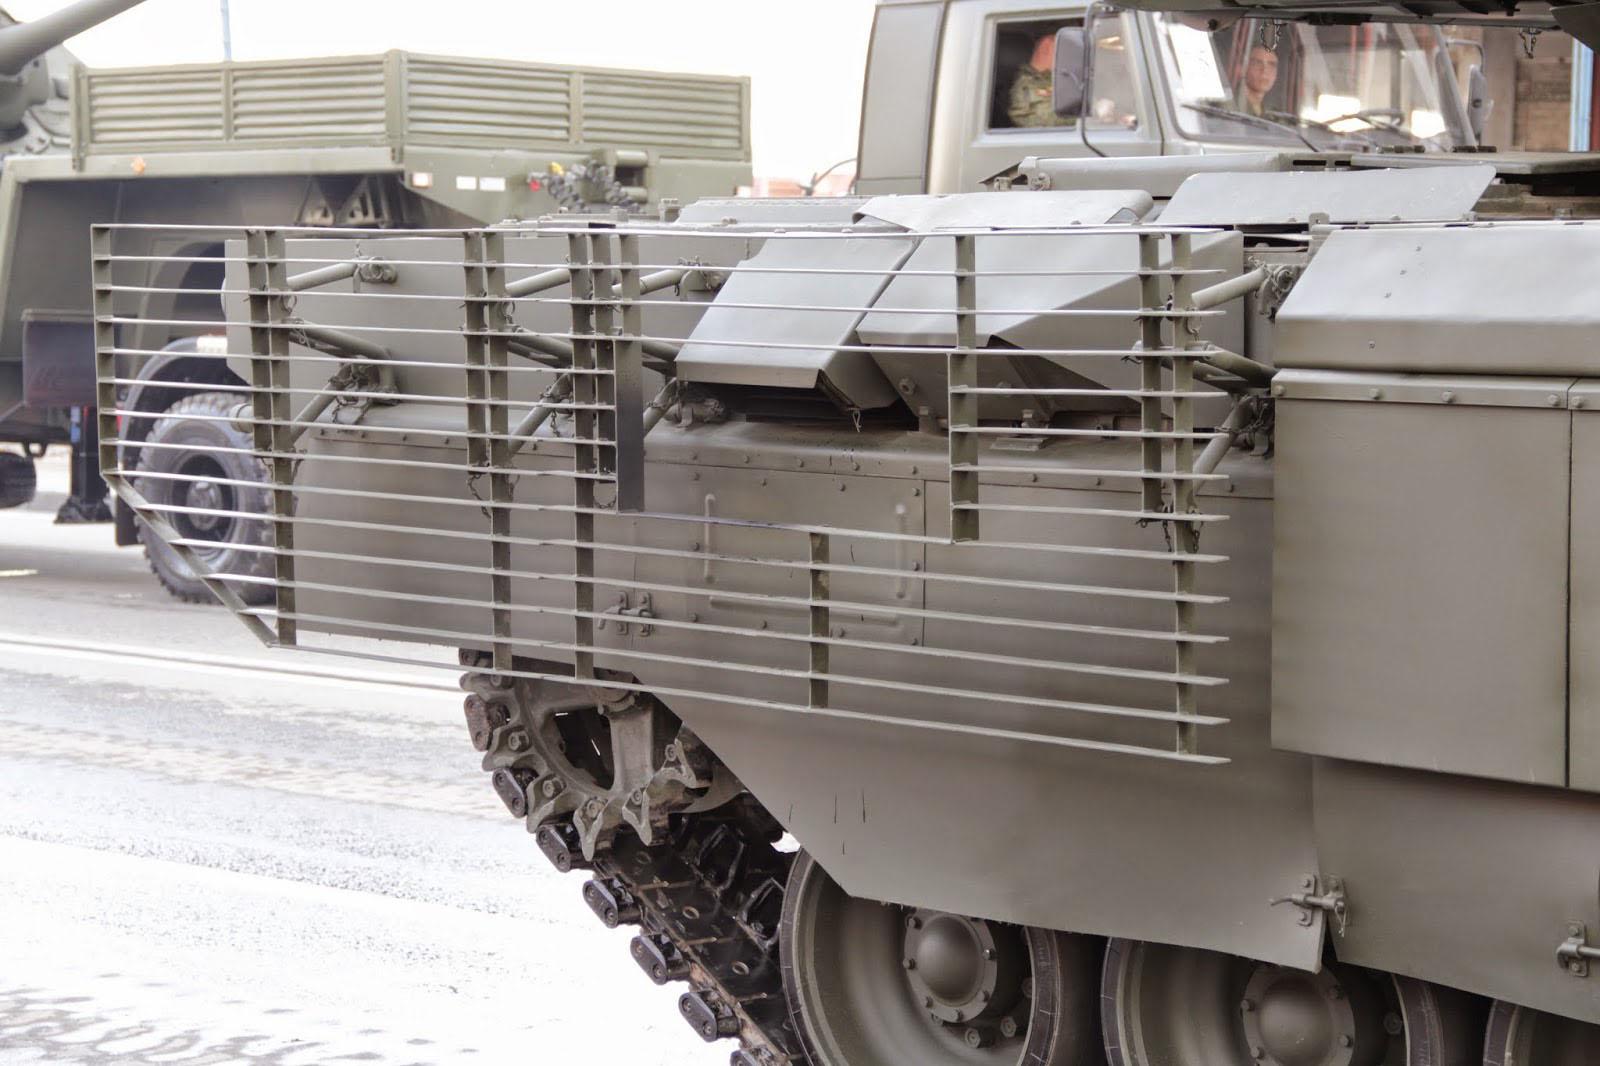 Armata: ¿el robotanque ruso? - Página 2 0_131ac4_769fa11e_orig